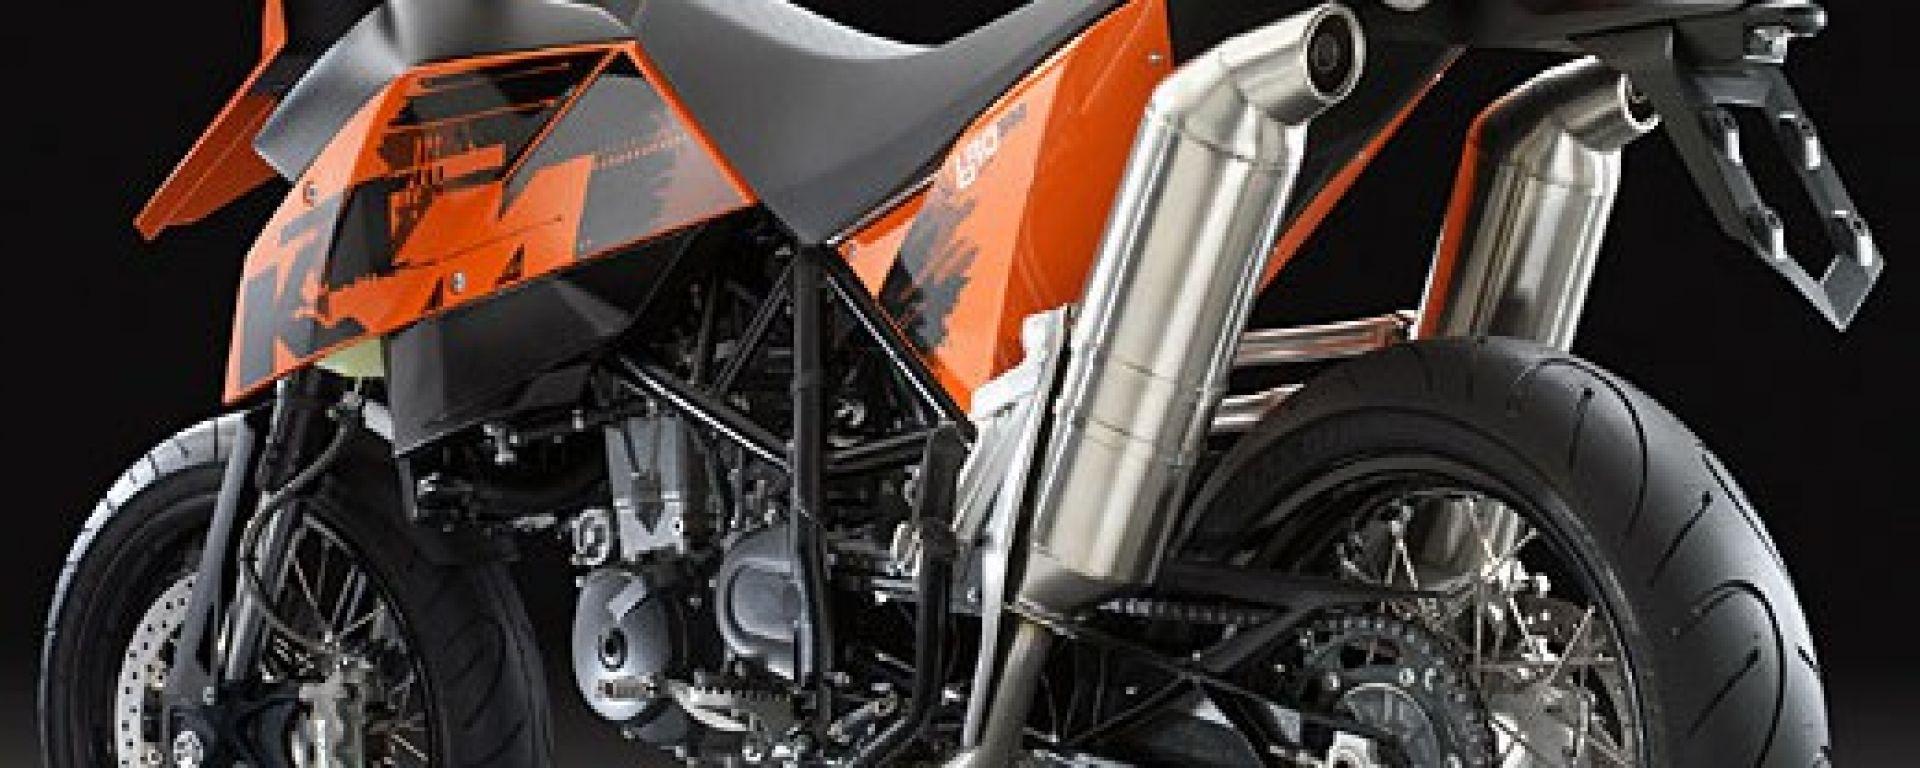 KTM SM 690